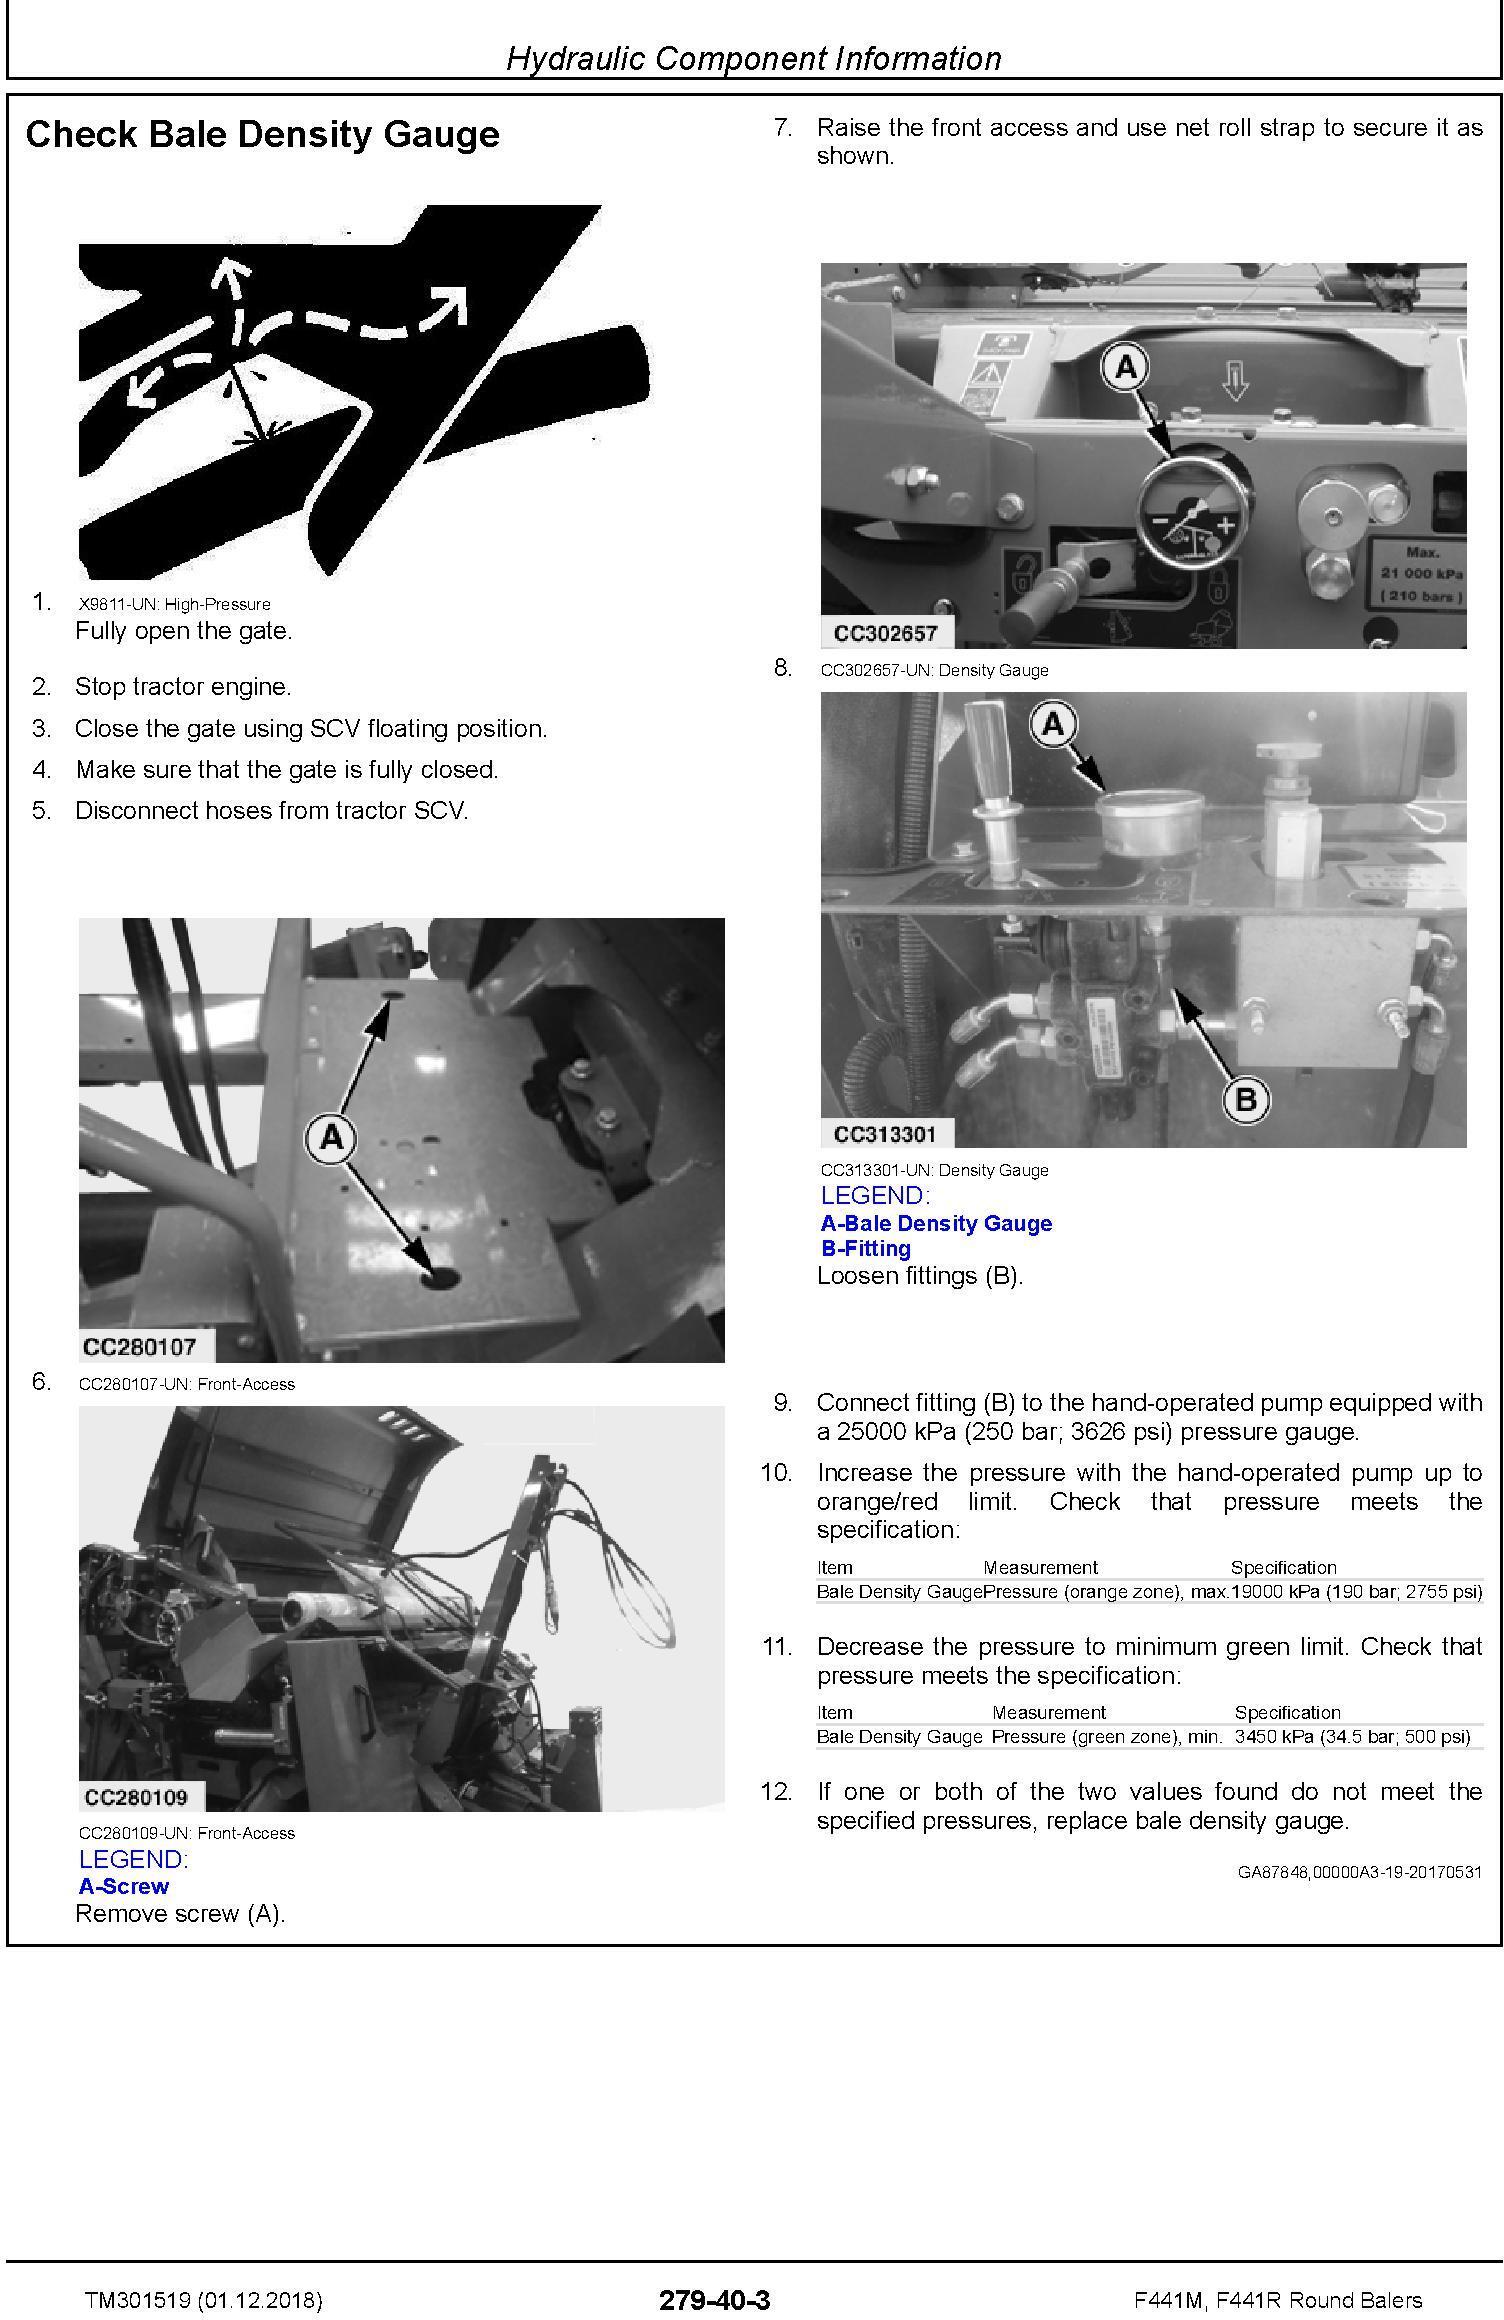 John Deere F441M, F441R Round Balers Diagnostic Technical Service Manual (TM301519) - 3